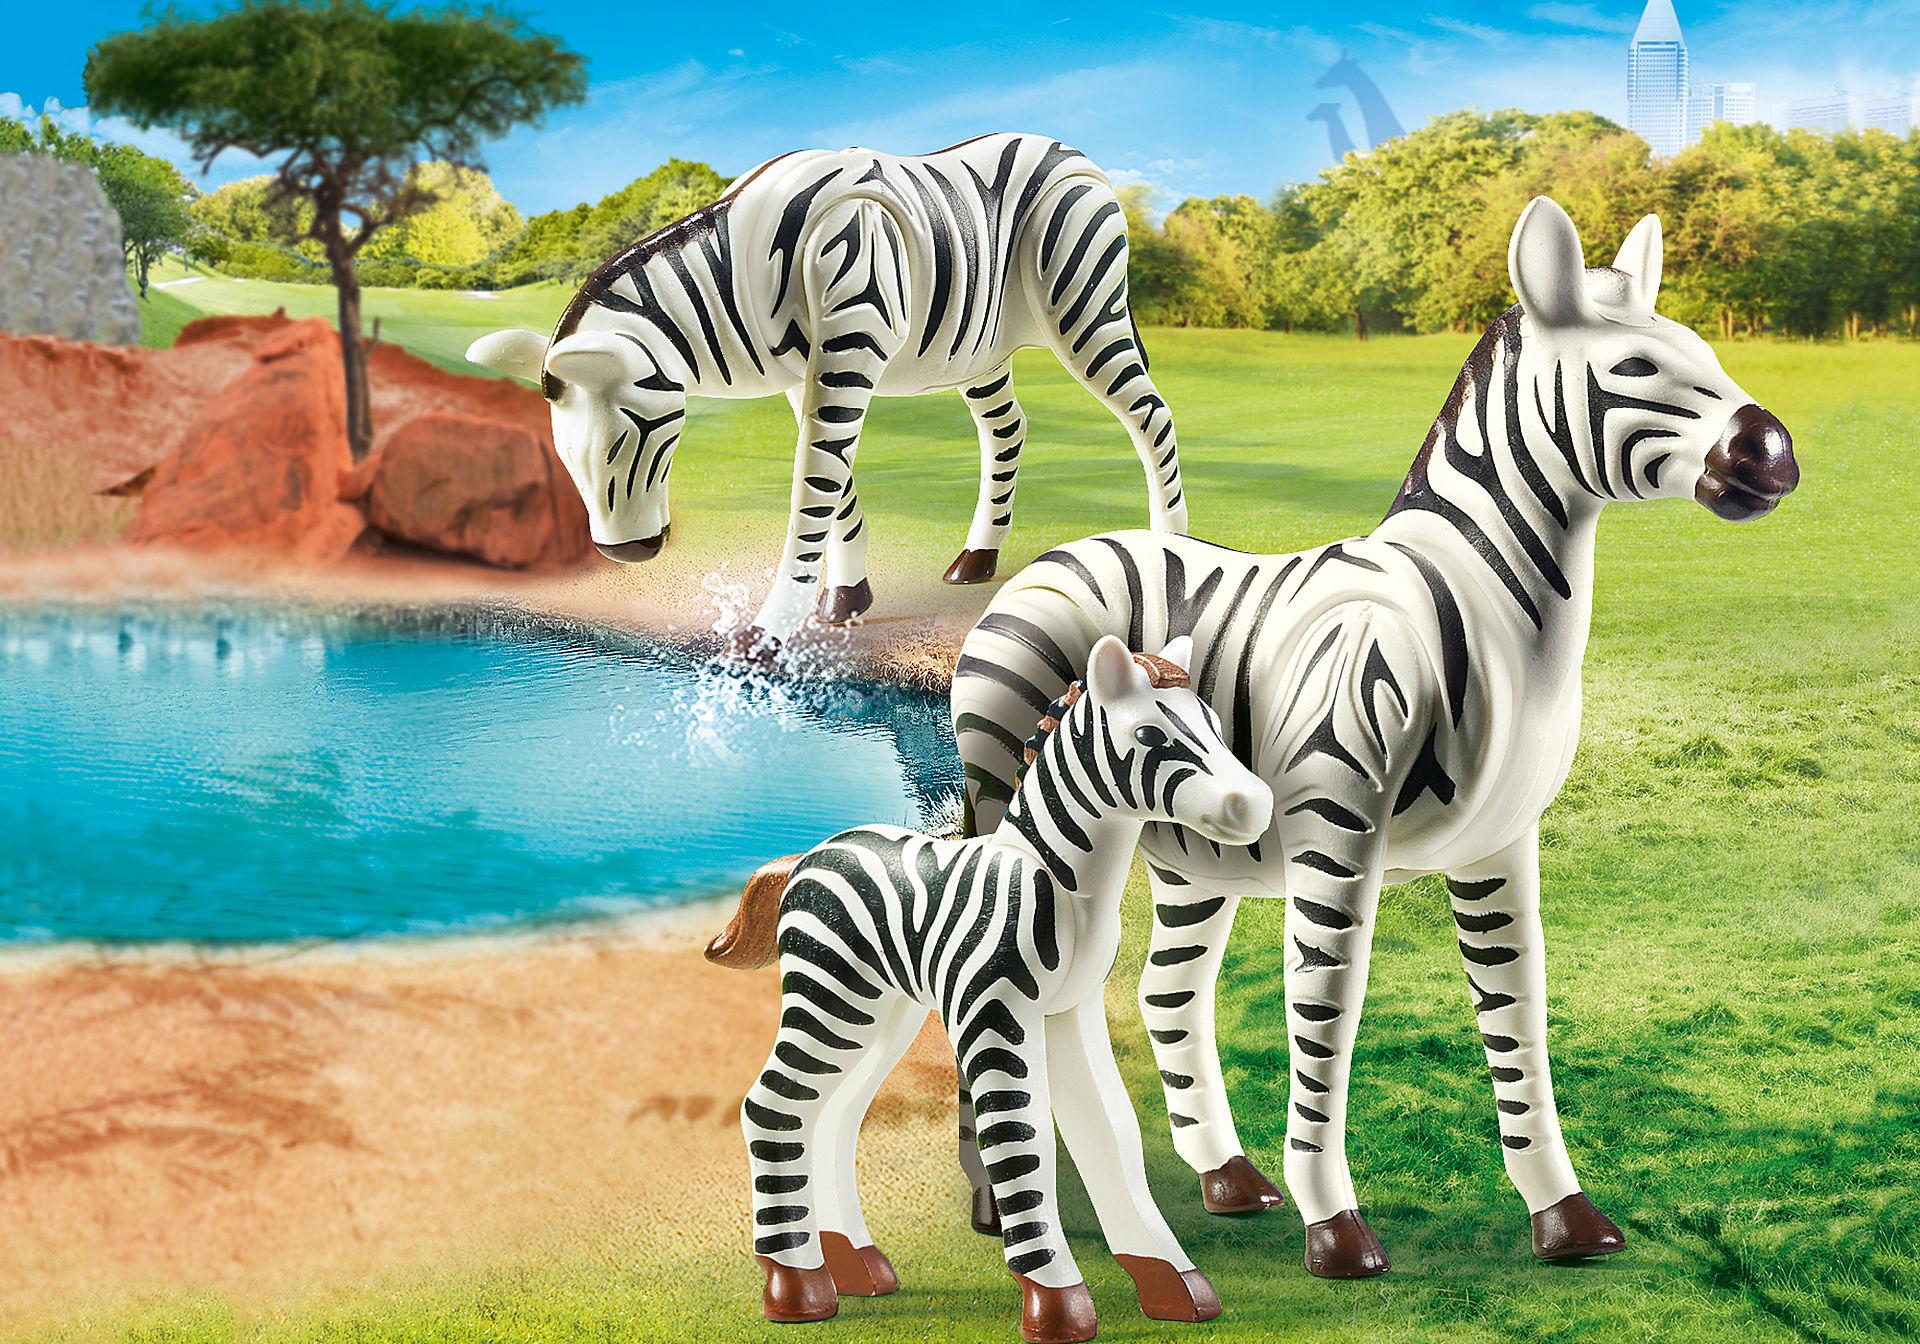 70356 2 Zebras mit Baby zoom image1